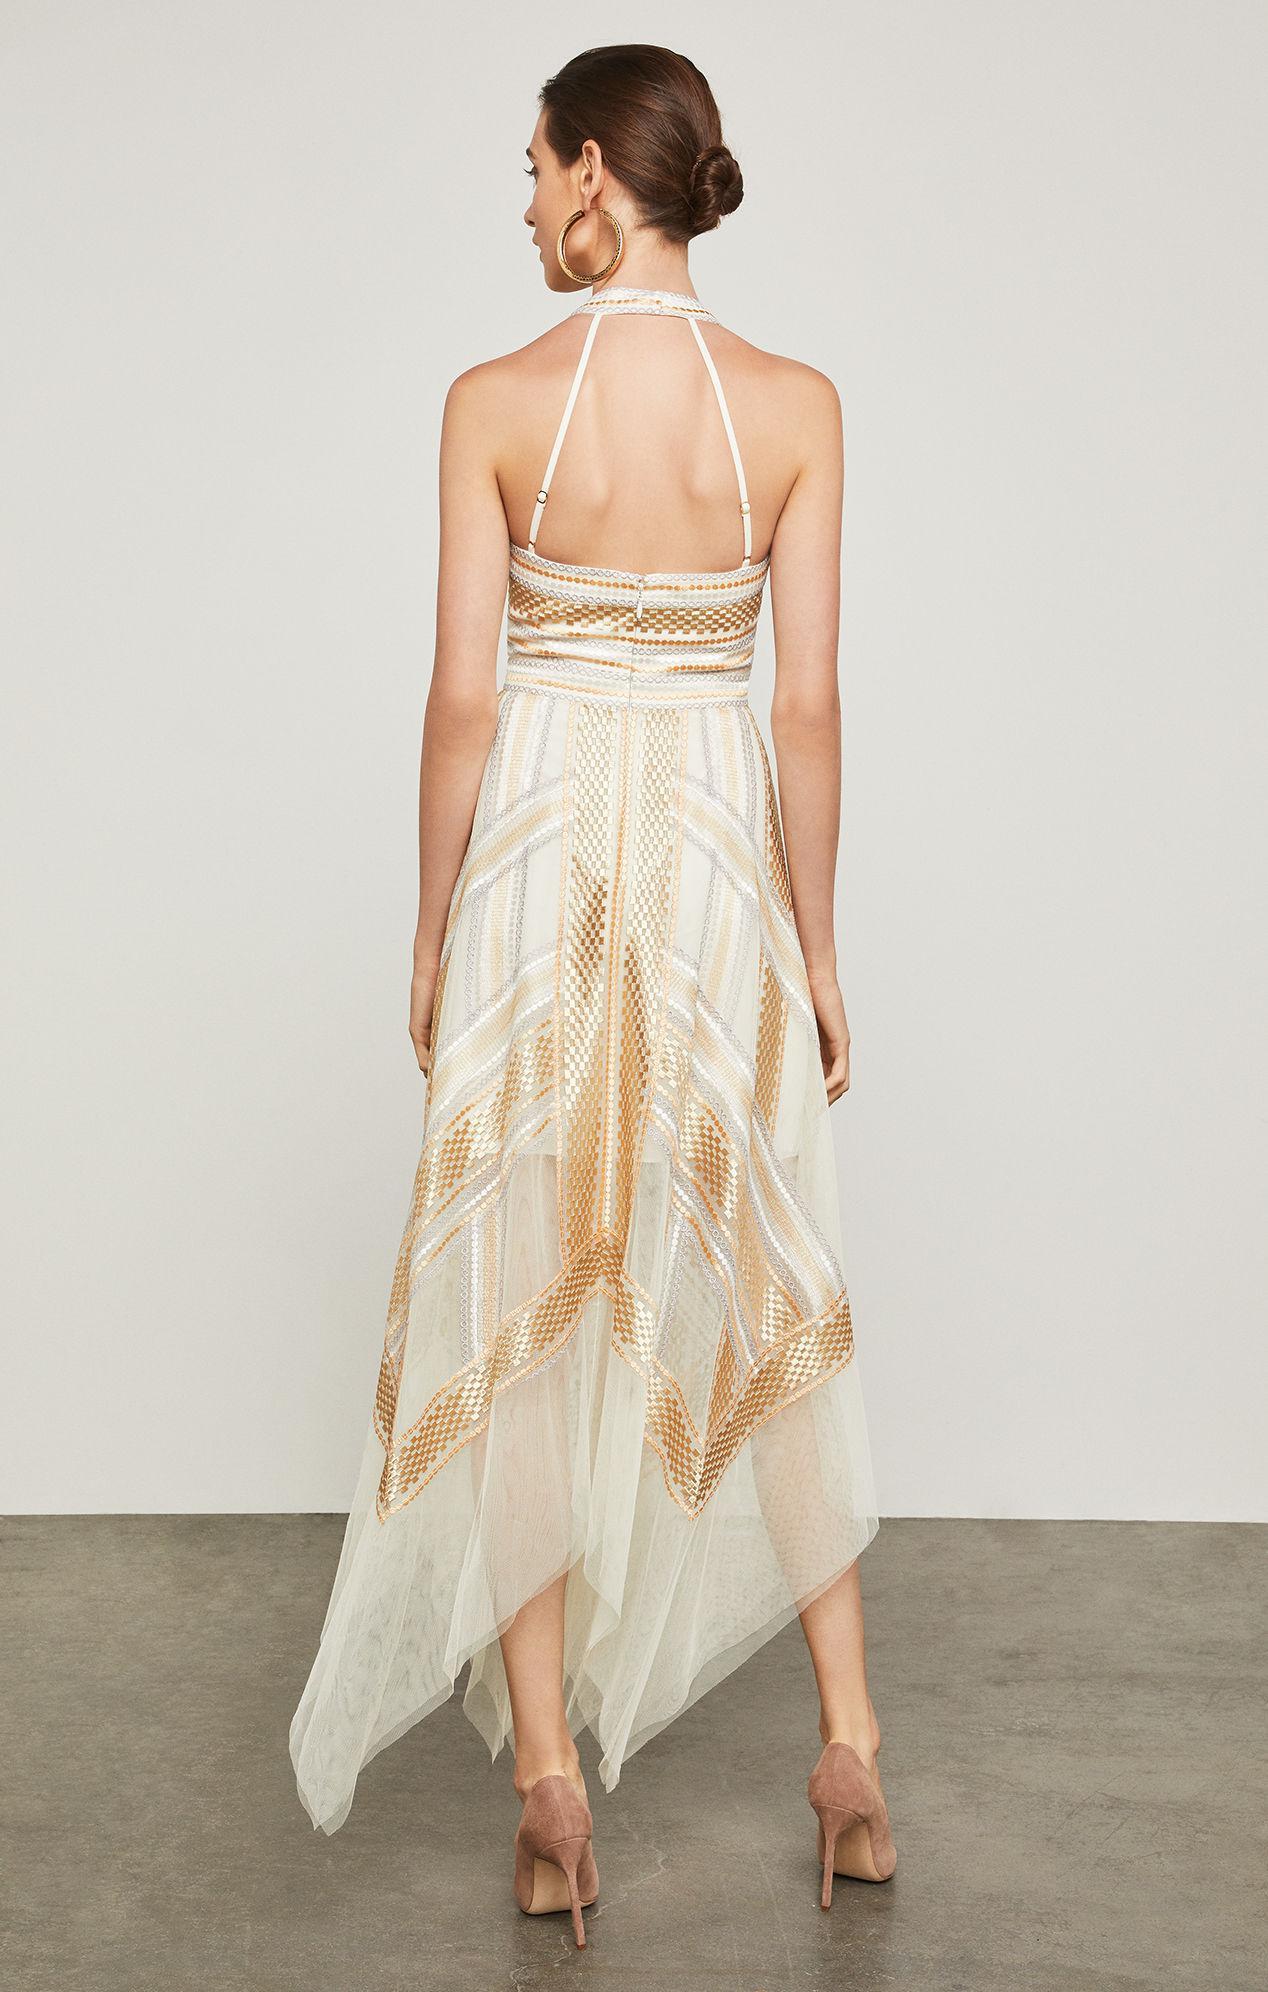 f92fee59a8c4 BCBGMAXAZRIA Bcbg Metallic Striped Handkerchief Dress in Metallic - Lyst